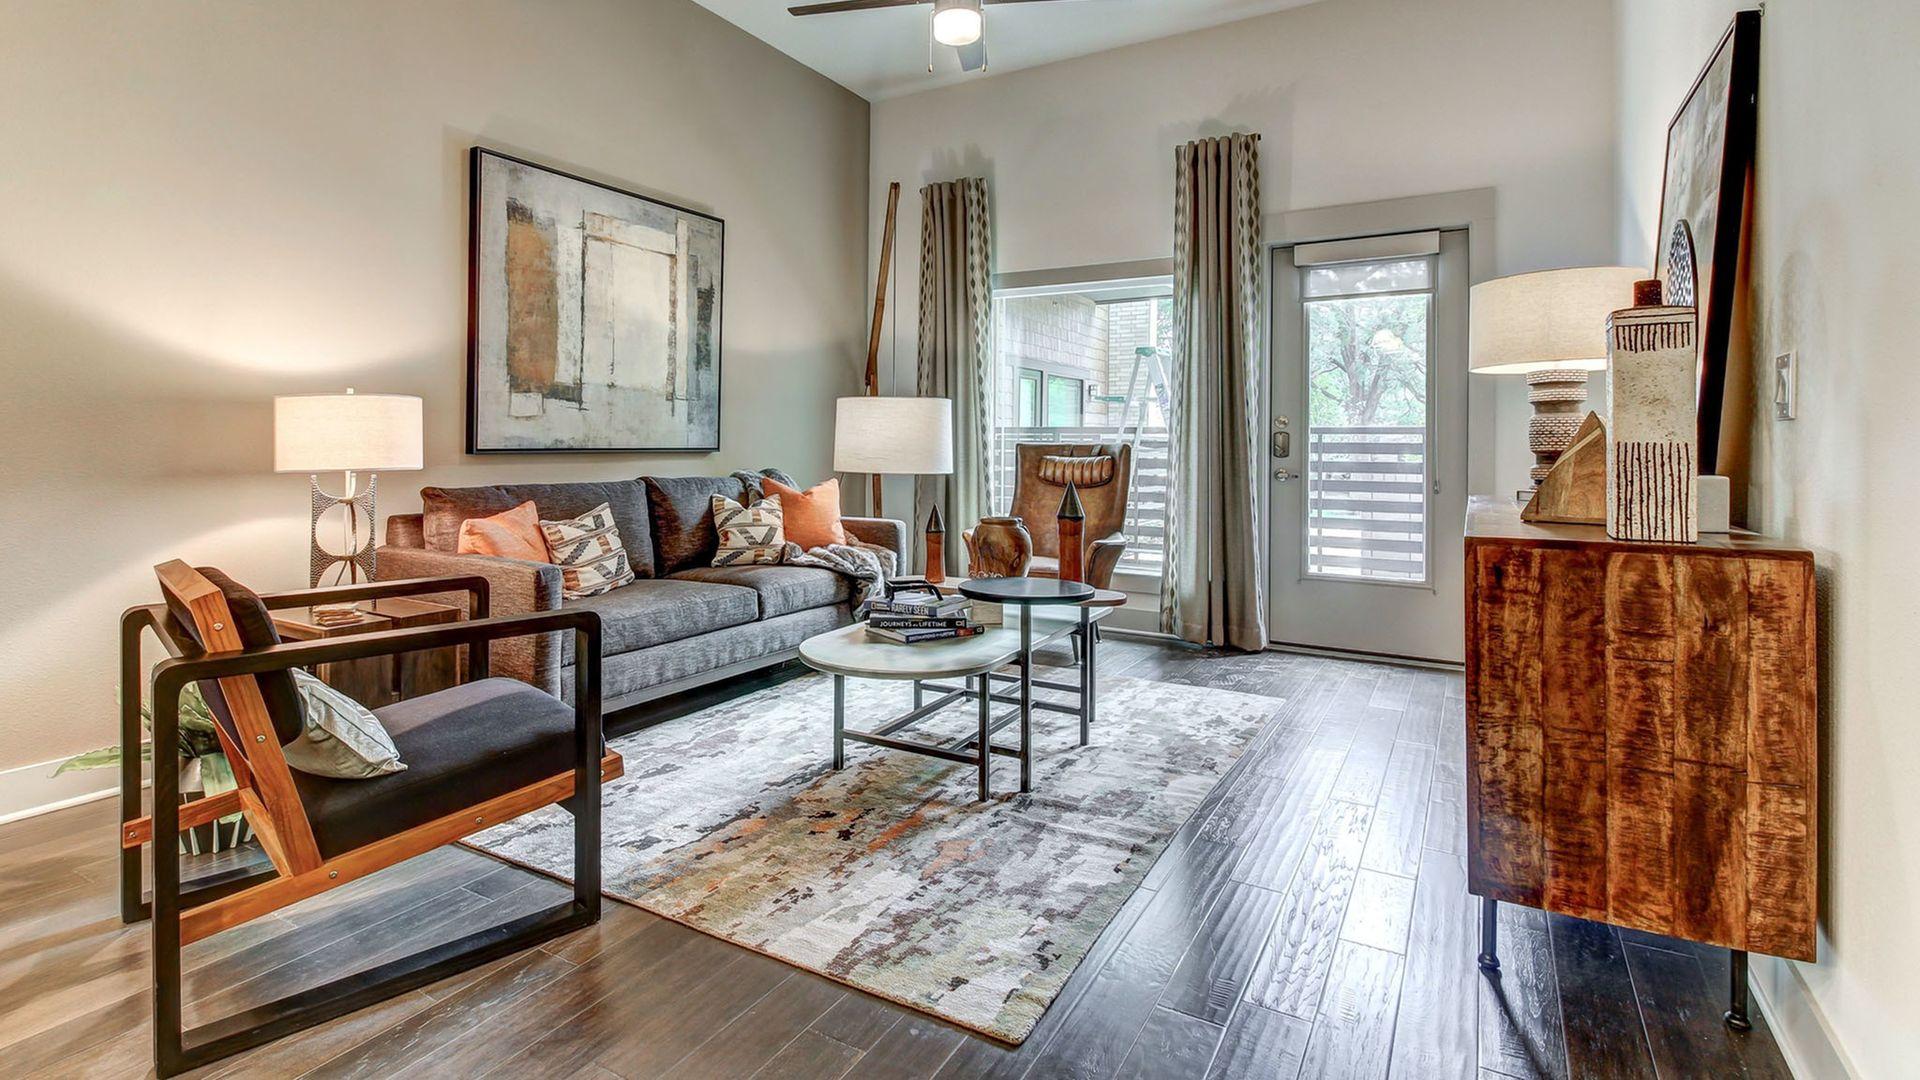 1bed apartment at 5550 longview street dallas tx 75206